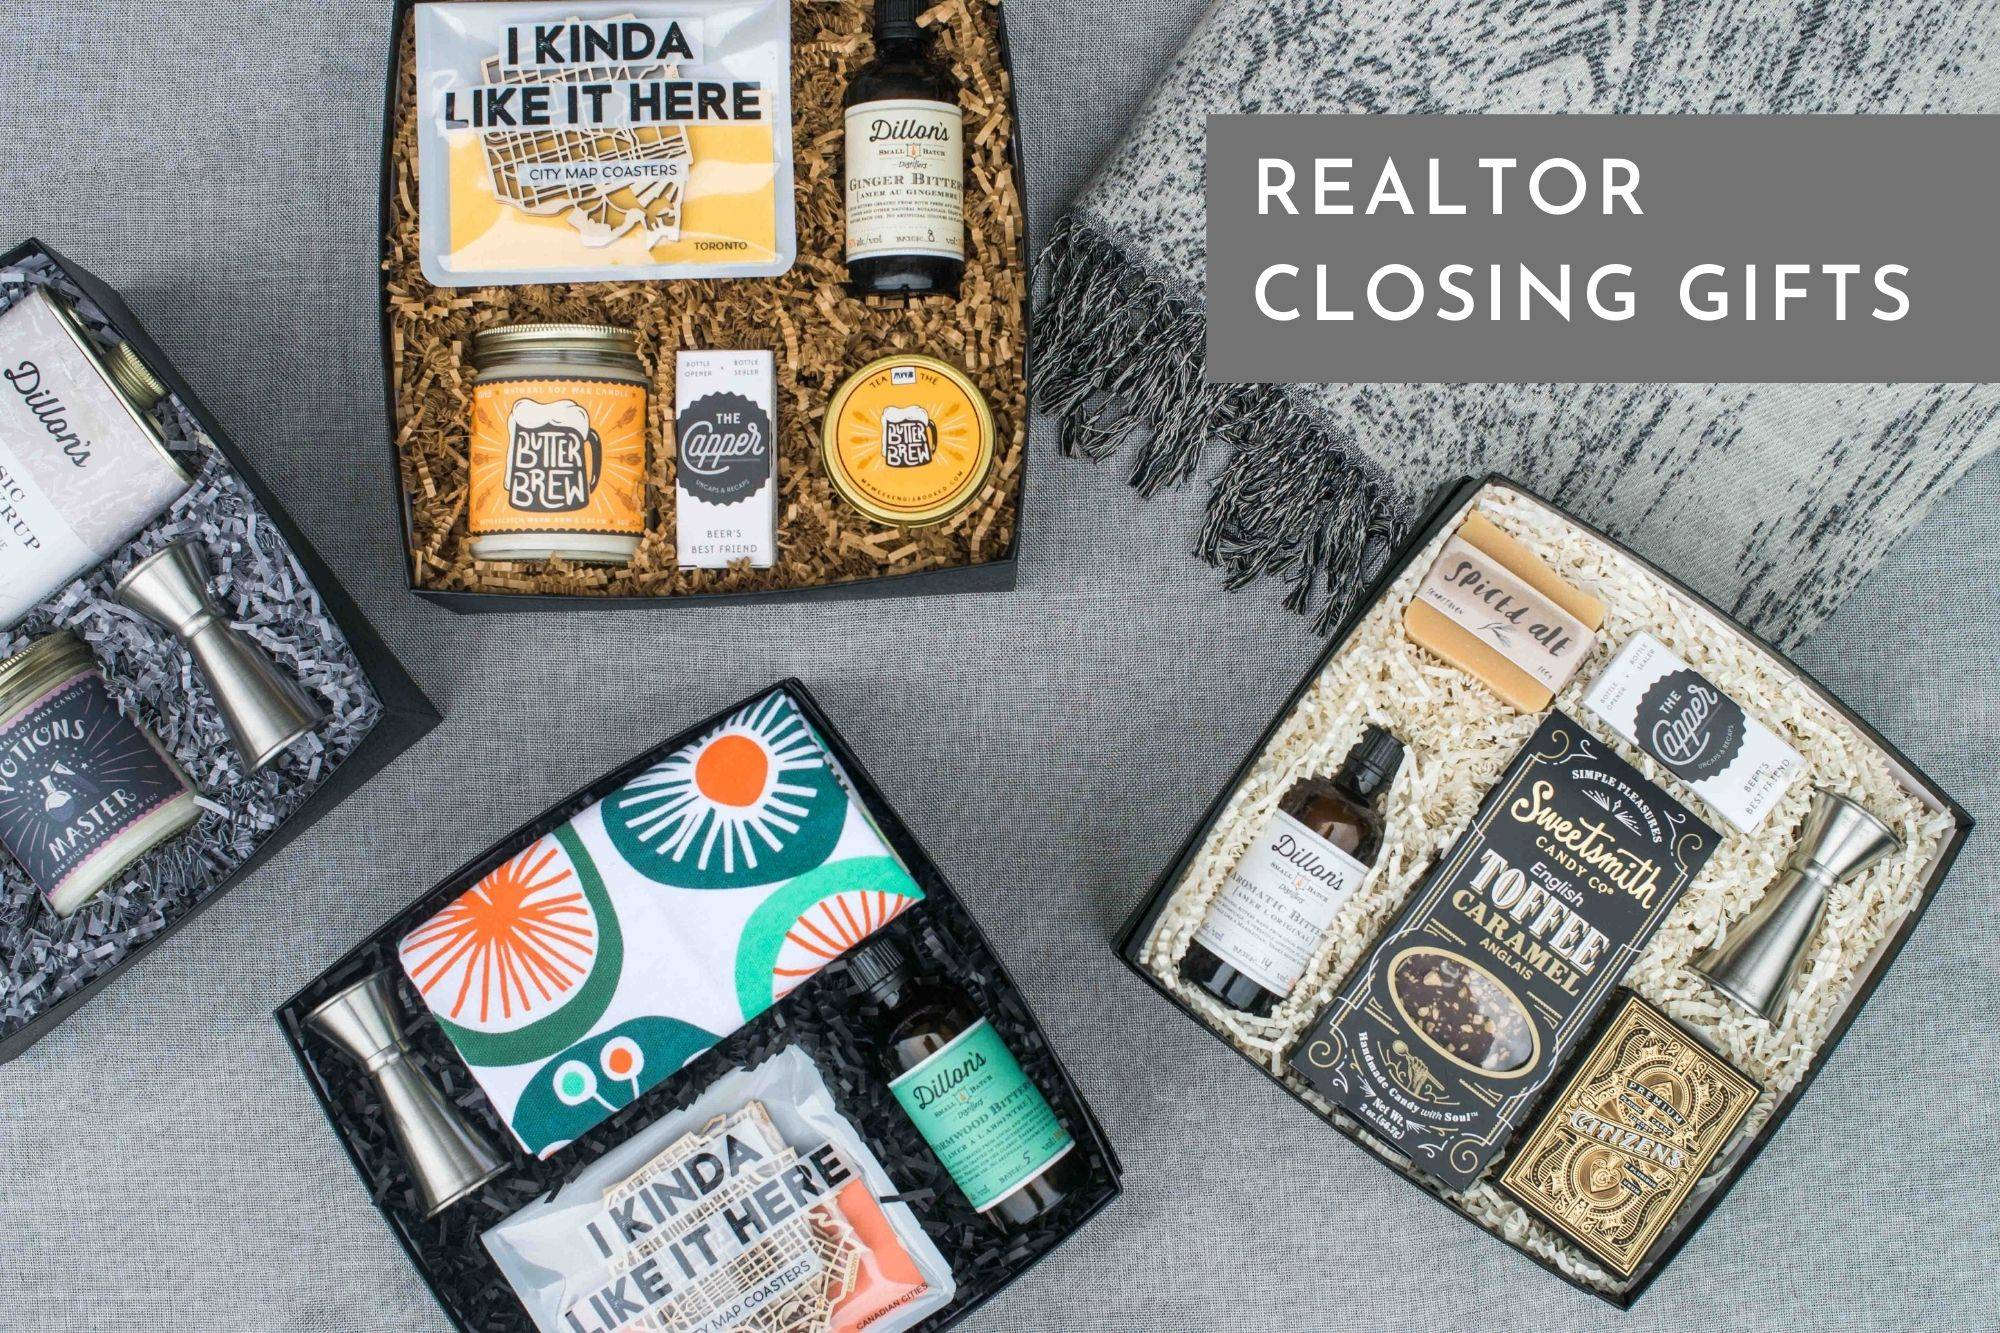 realtor closing gift canada